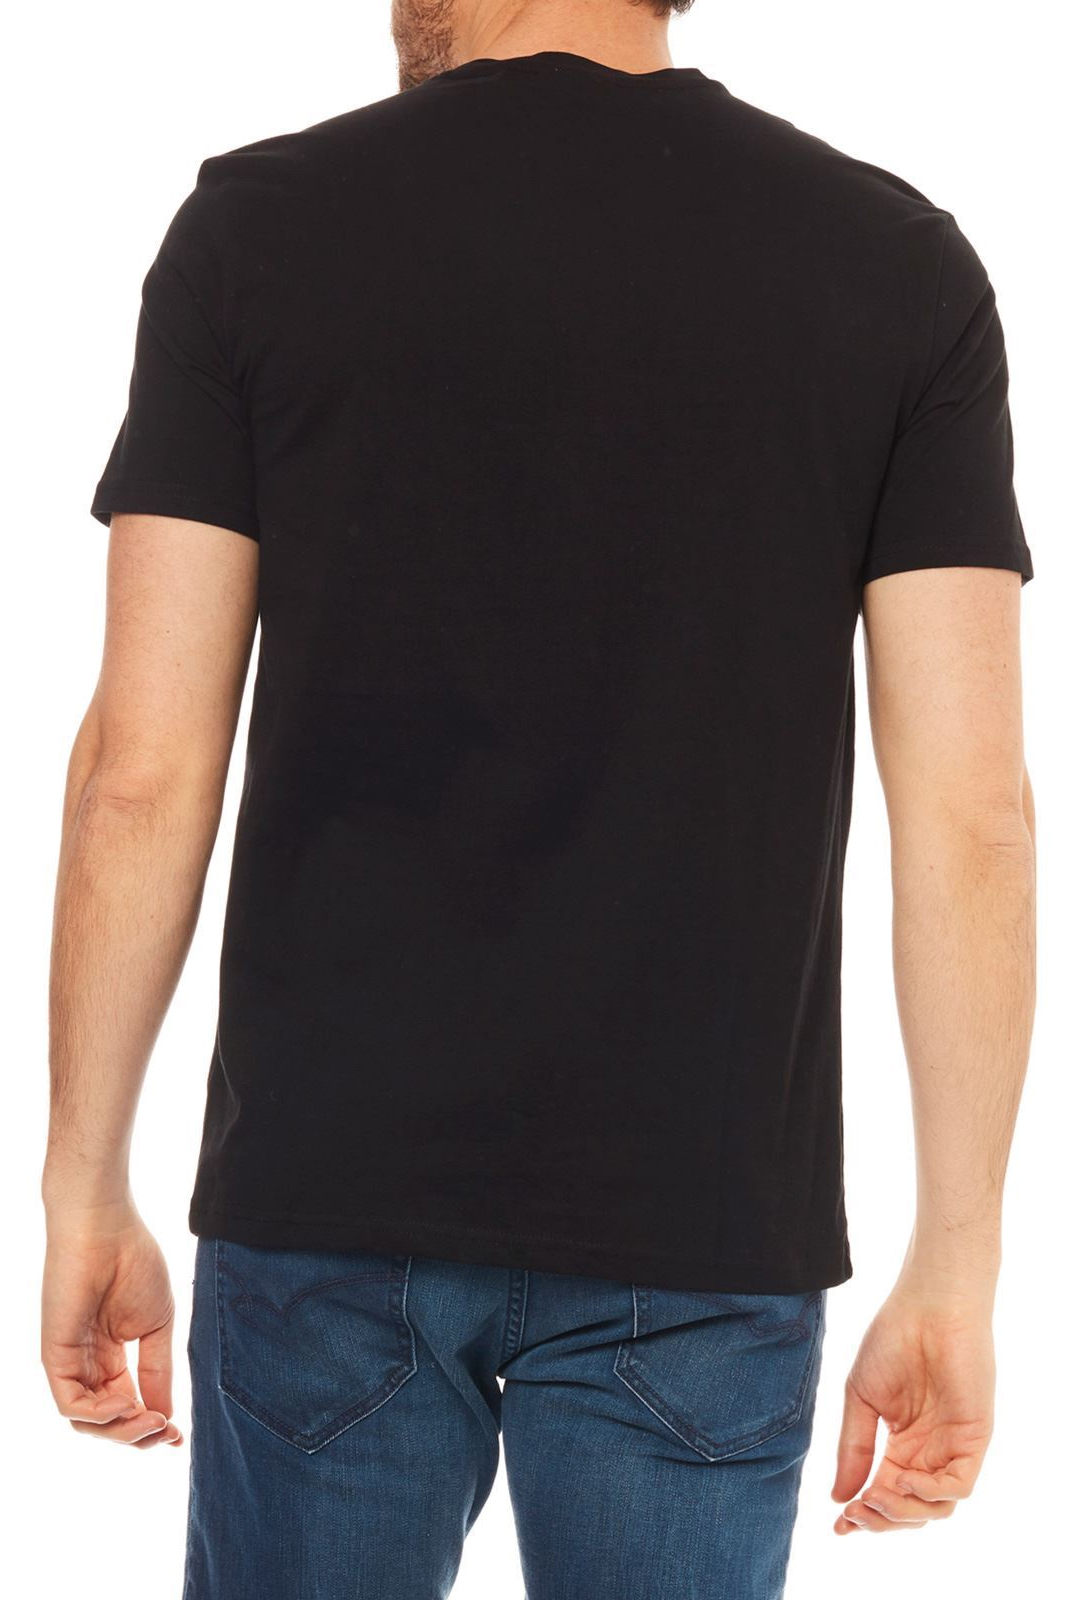 Tee-shirts  Kaporal PARC BLACK